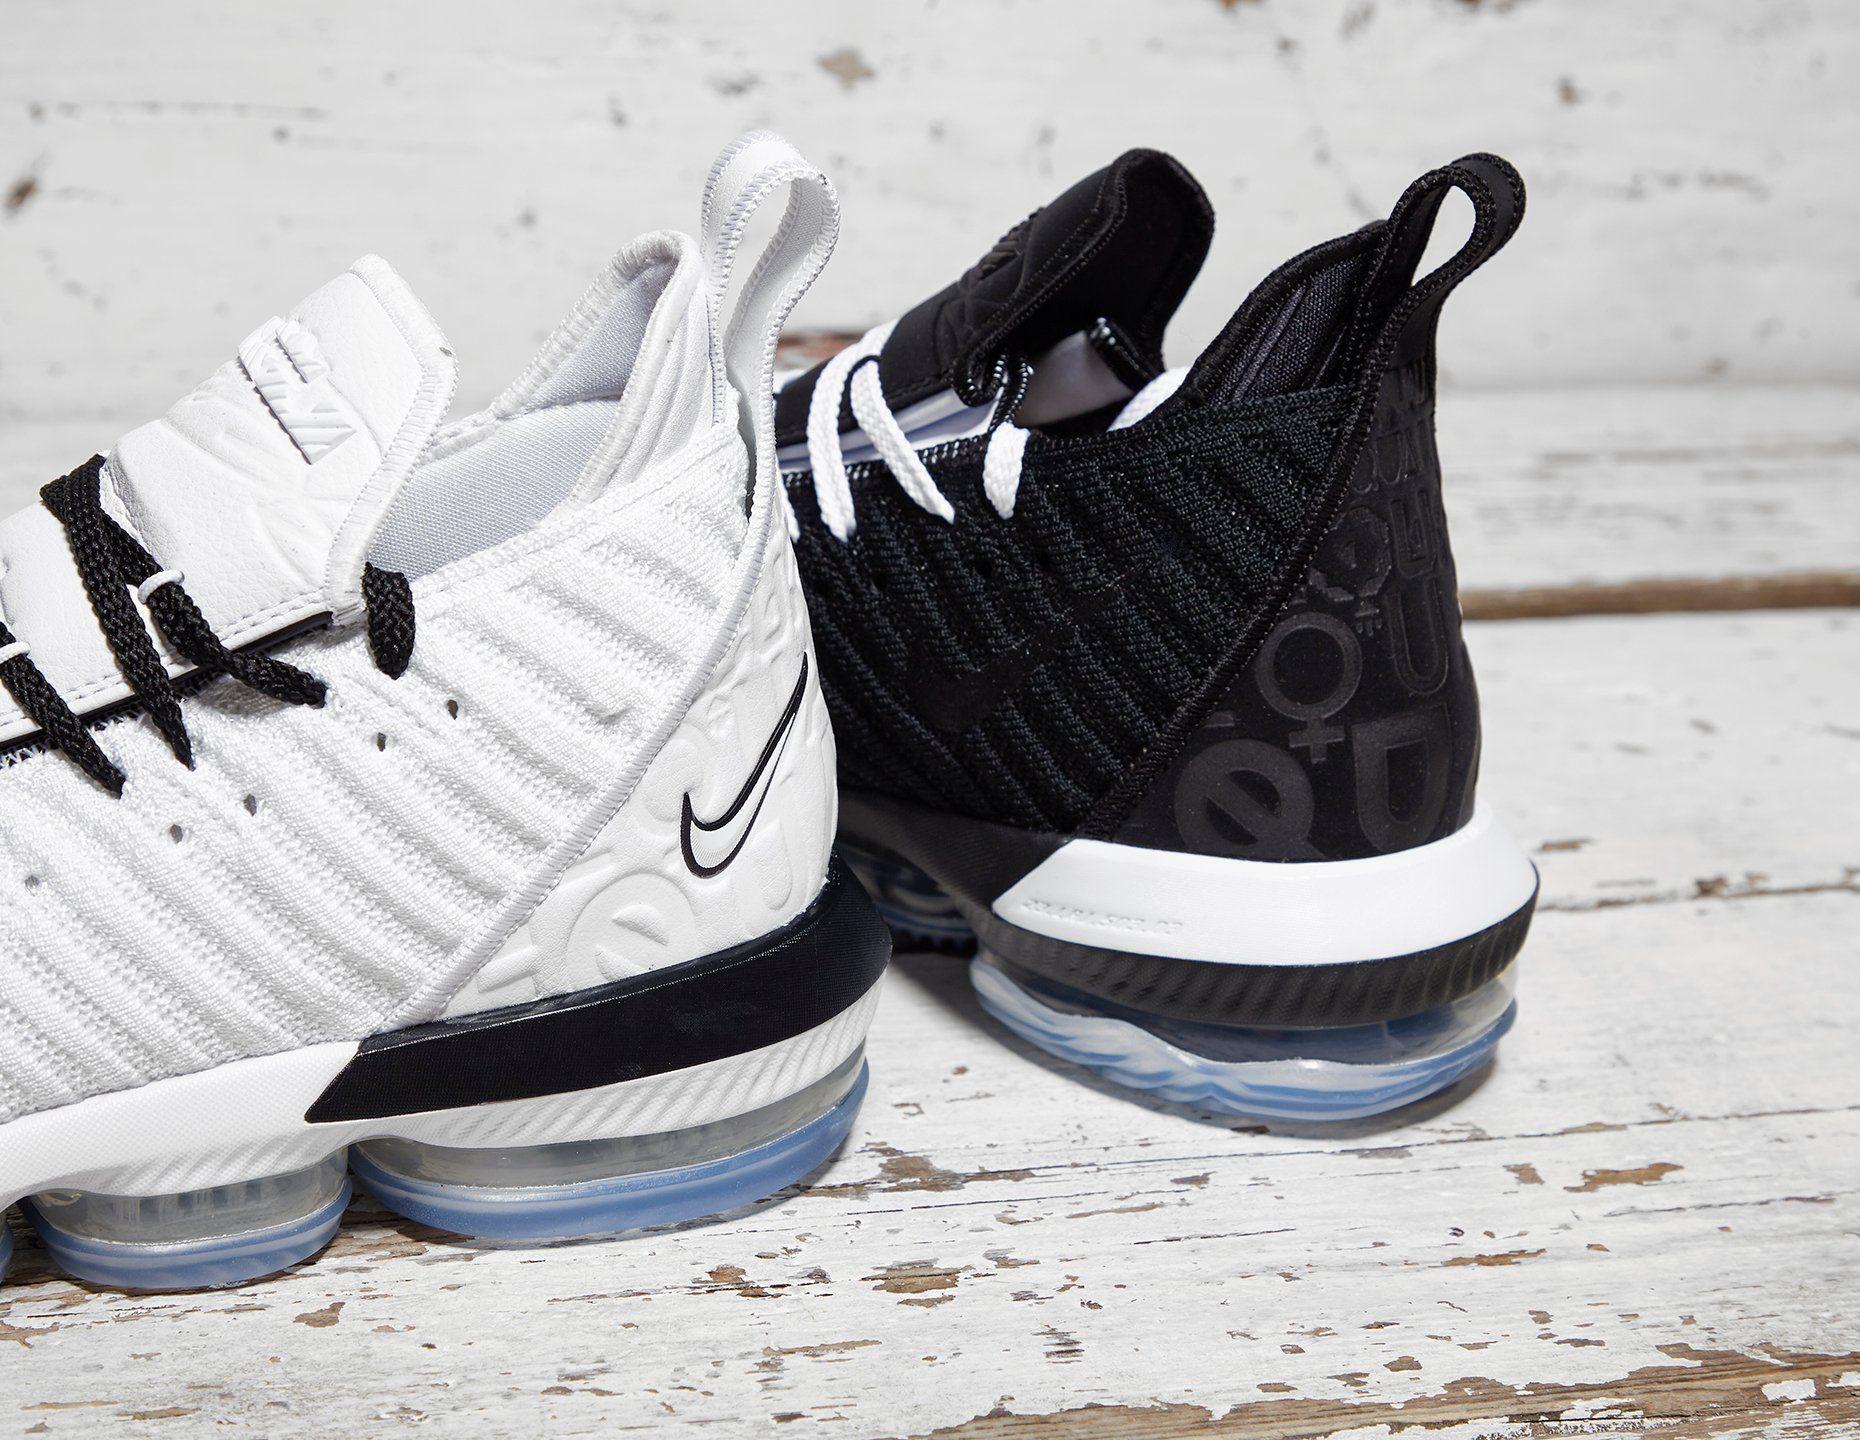 Nike LeBron XVI 'Equality' QS